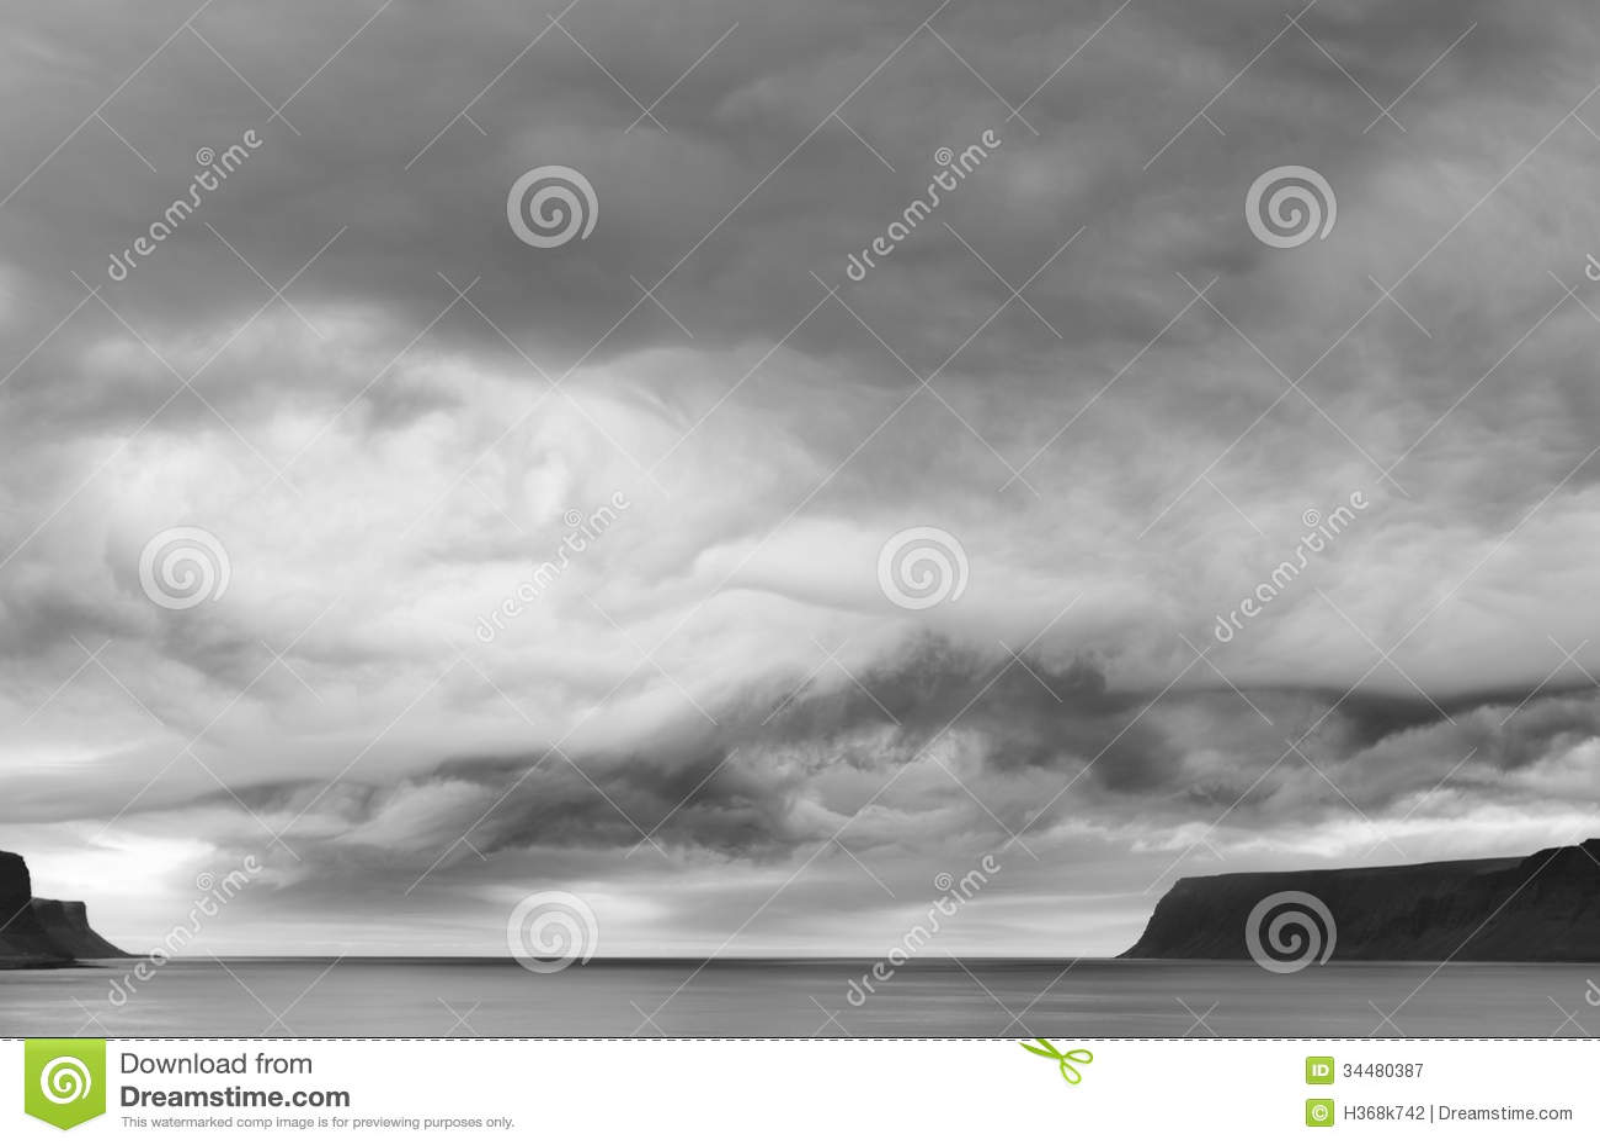 Patreksfjordur Iceland  city pictures gallery : Dramatic cloudy sky at Iceland sea coast Patreksfjordur fiord black ...